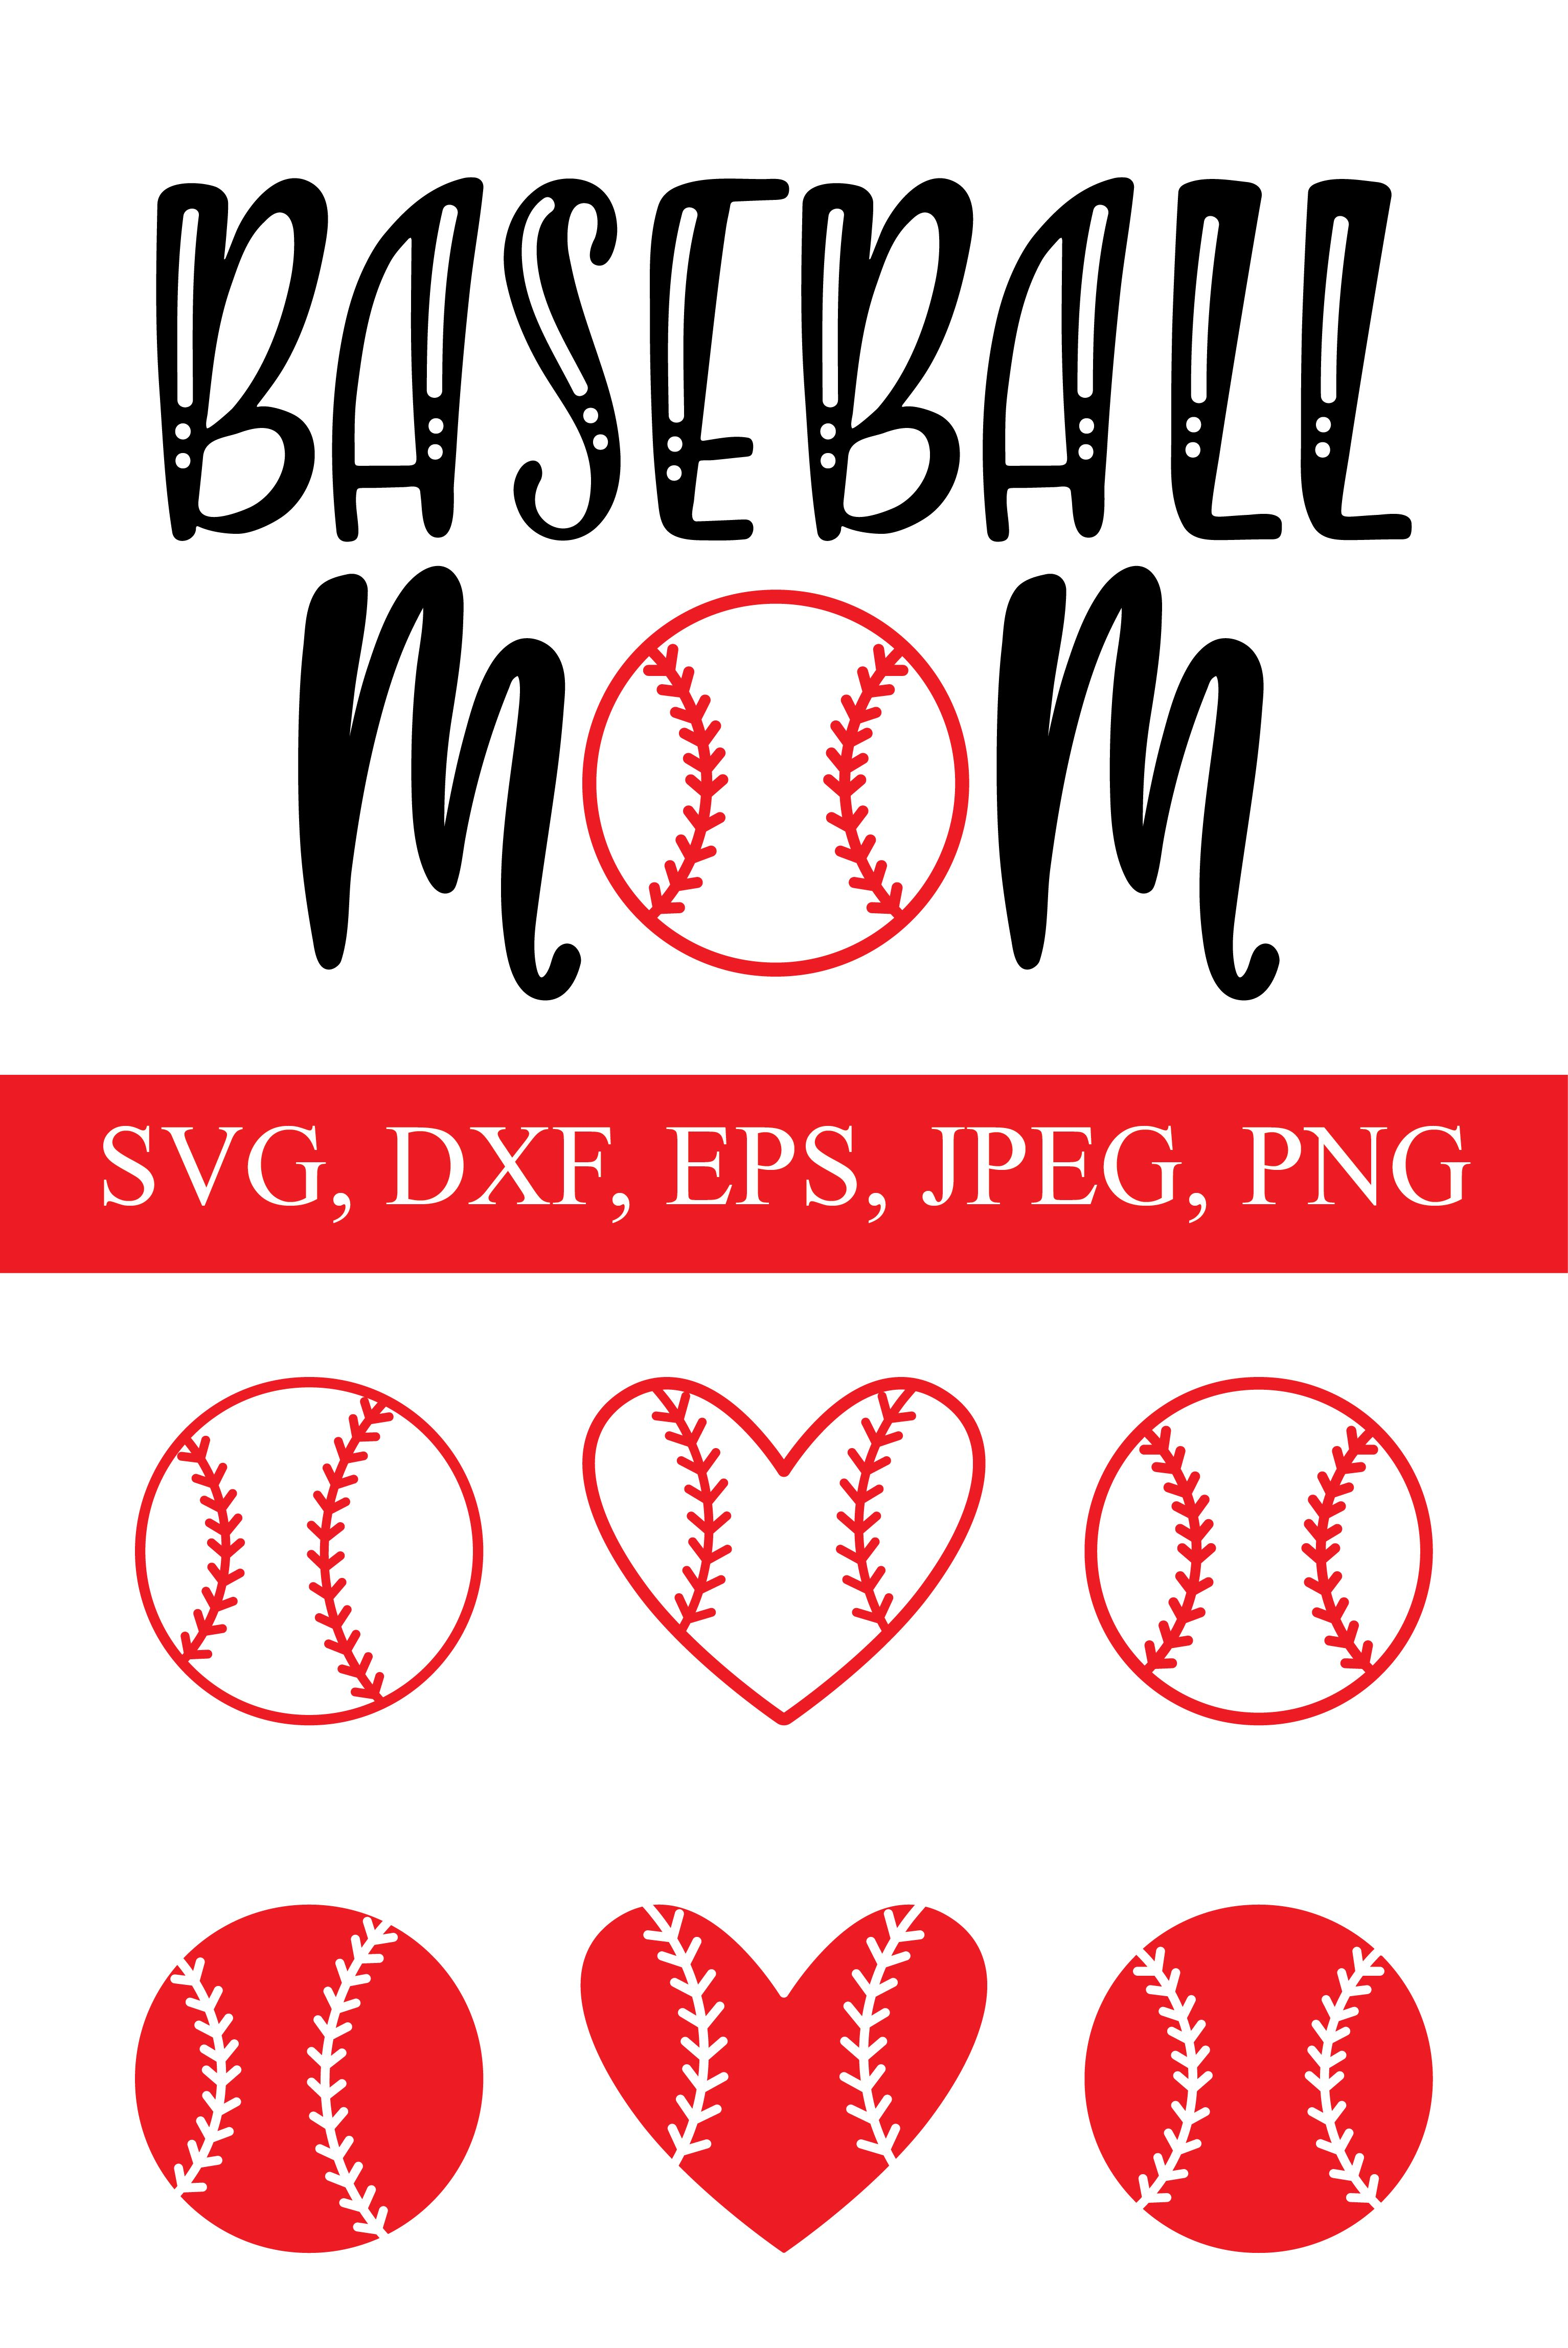 Ball Heart Svg Baseball Heart Svg Baseball Love Svg Baseball Svg Eps Clipart Baseball Shirt Cut File Monogram Svg Dxf Stitches Svg Craft Supplies Tools Visual Arts